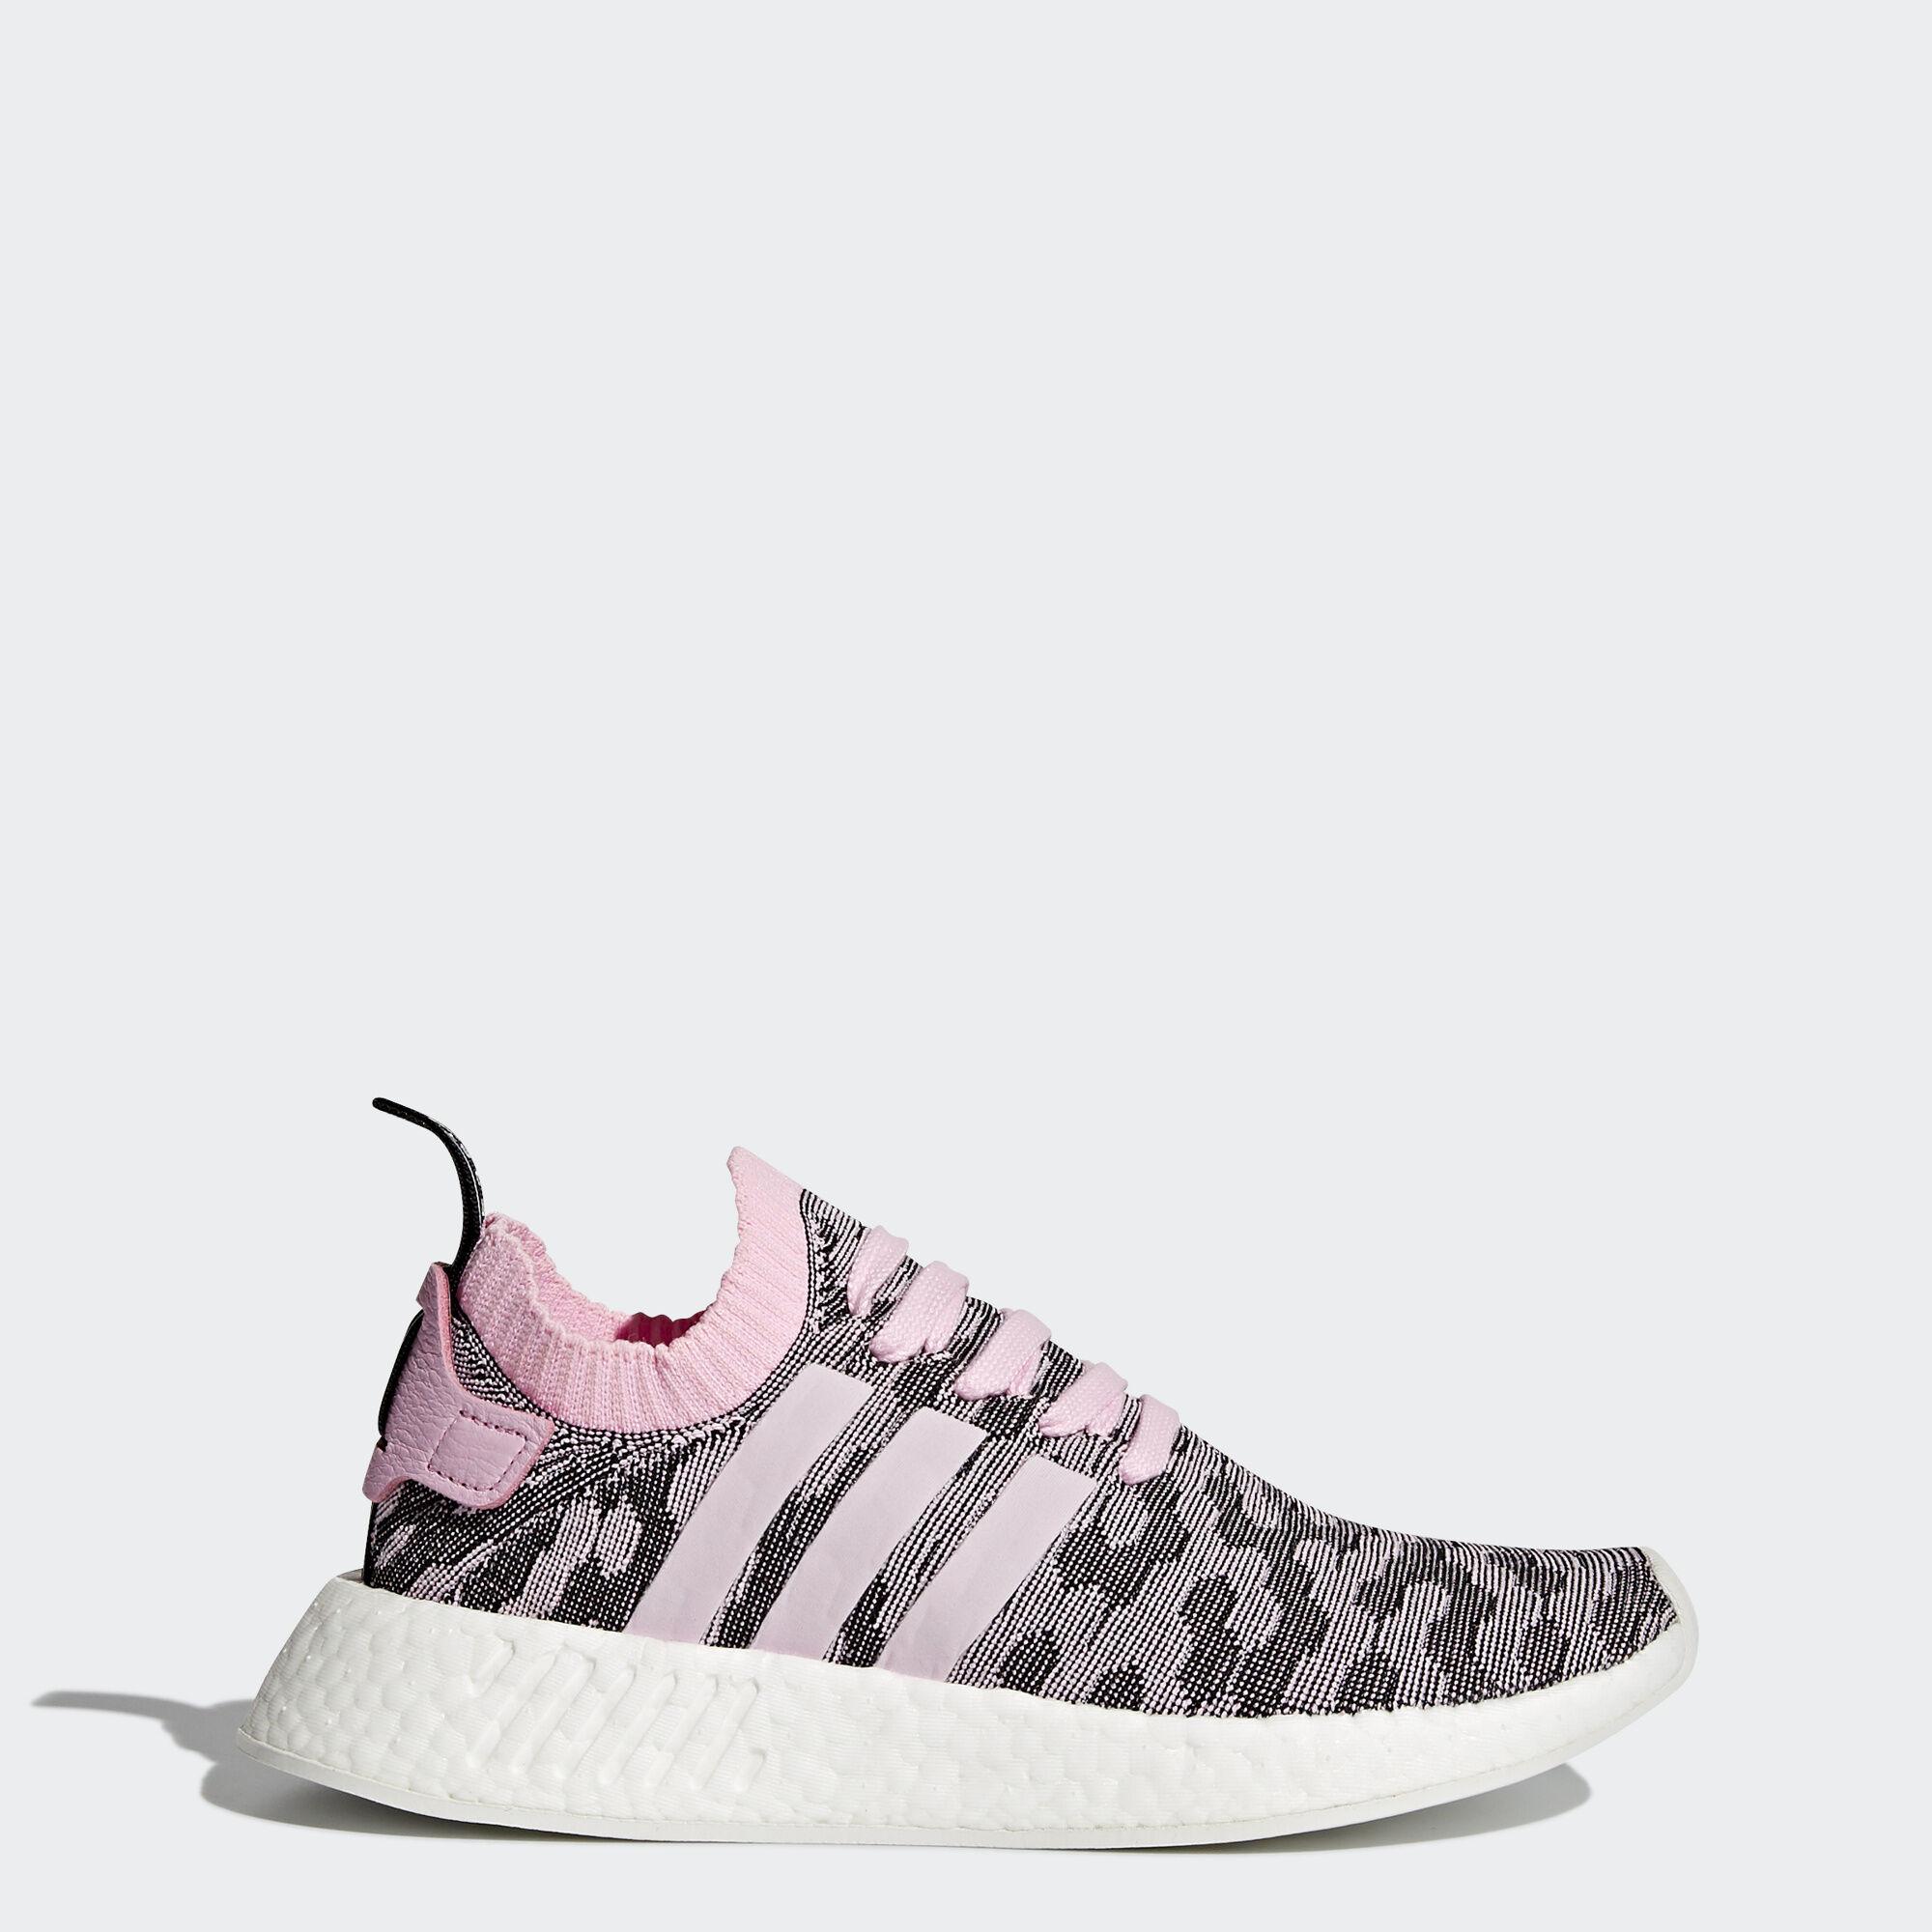 Pink Black Womens Purple Crazy Price Adidas Zx 750 Stars Running Shoes